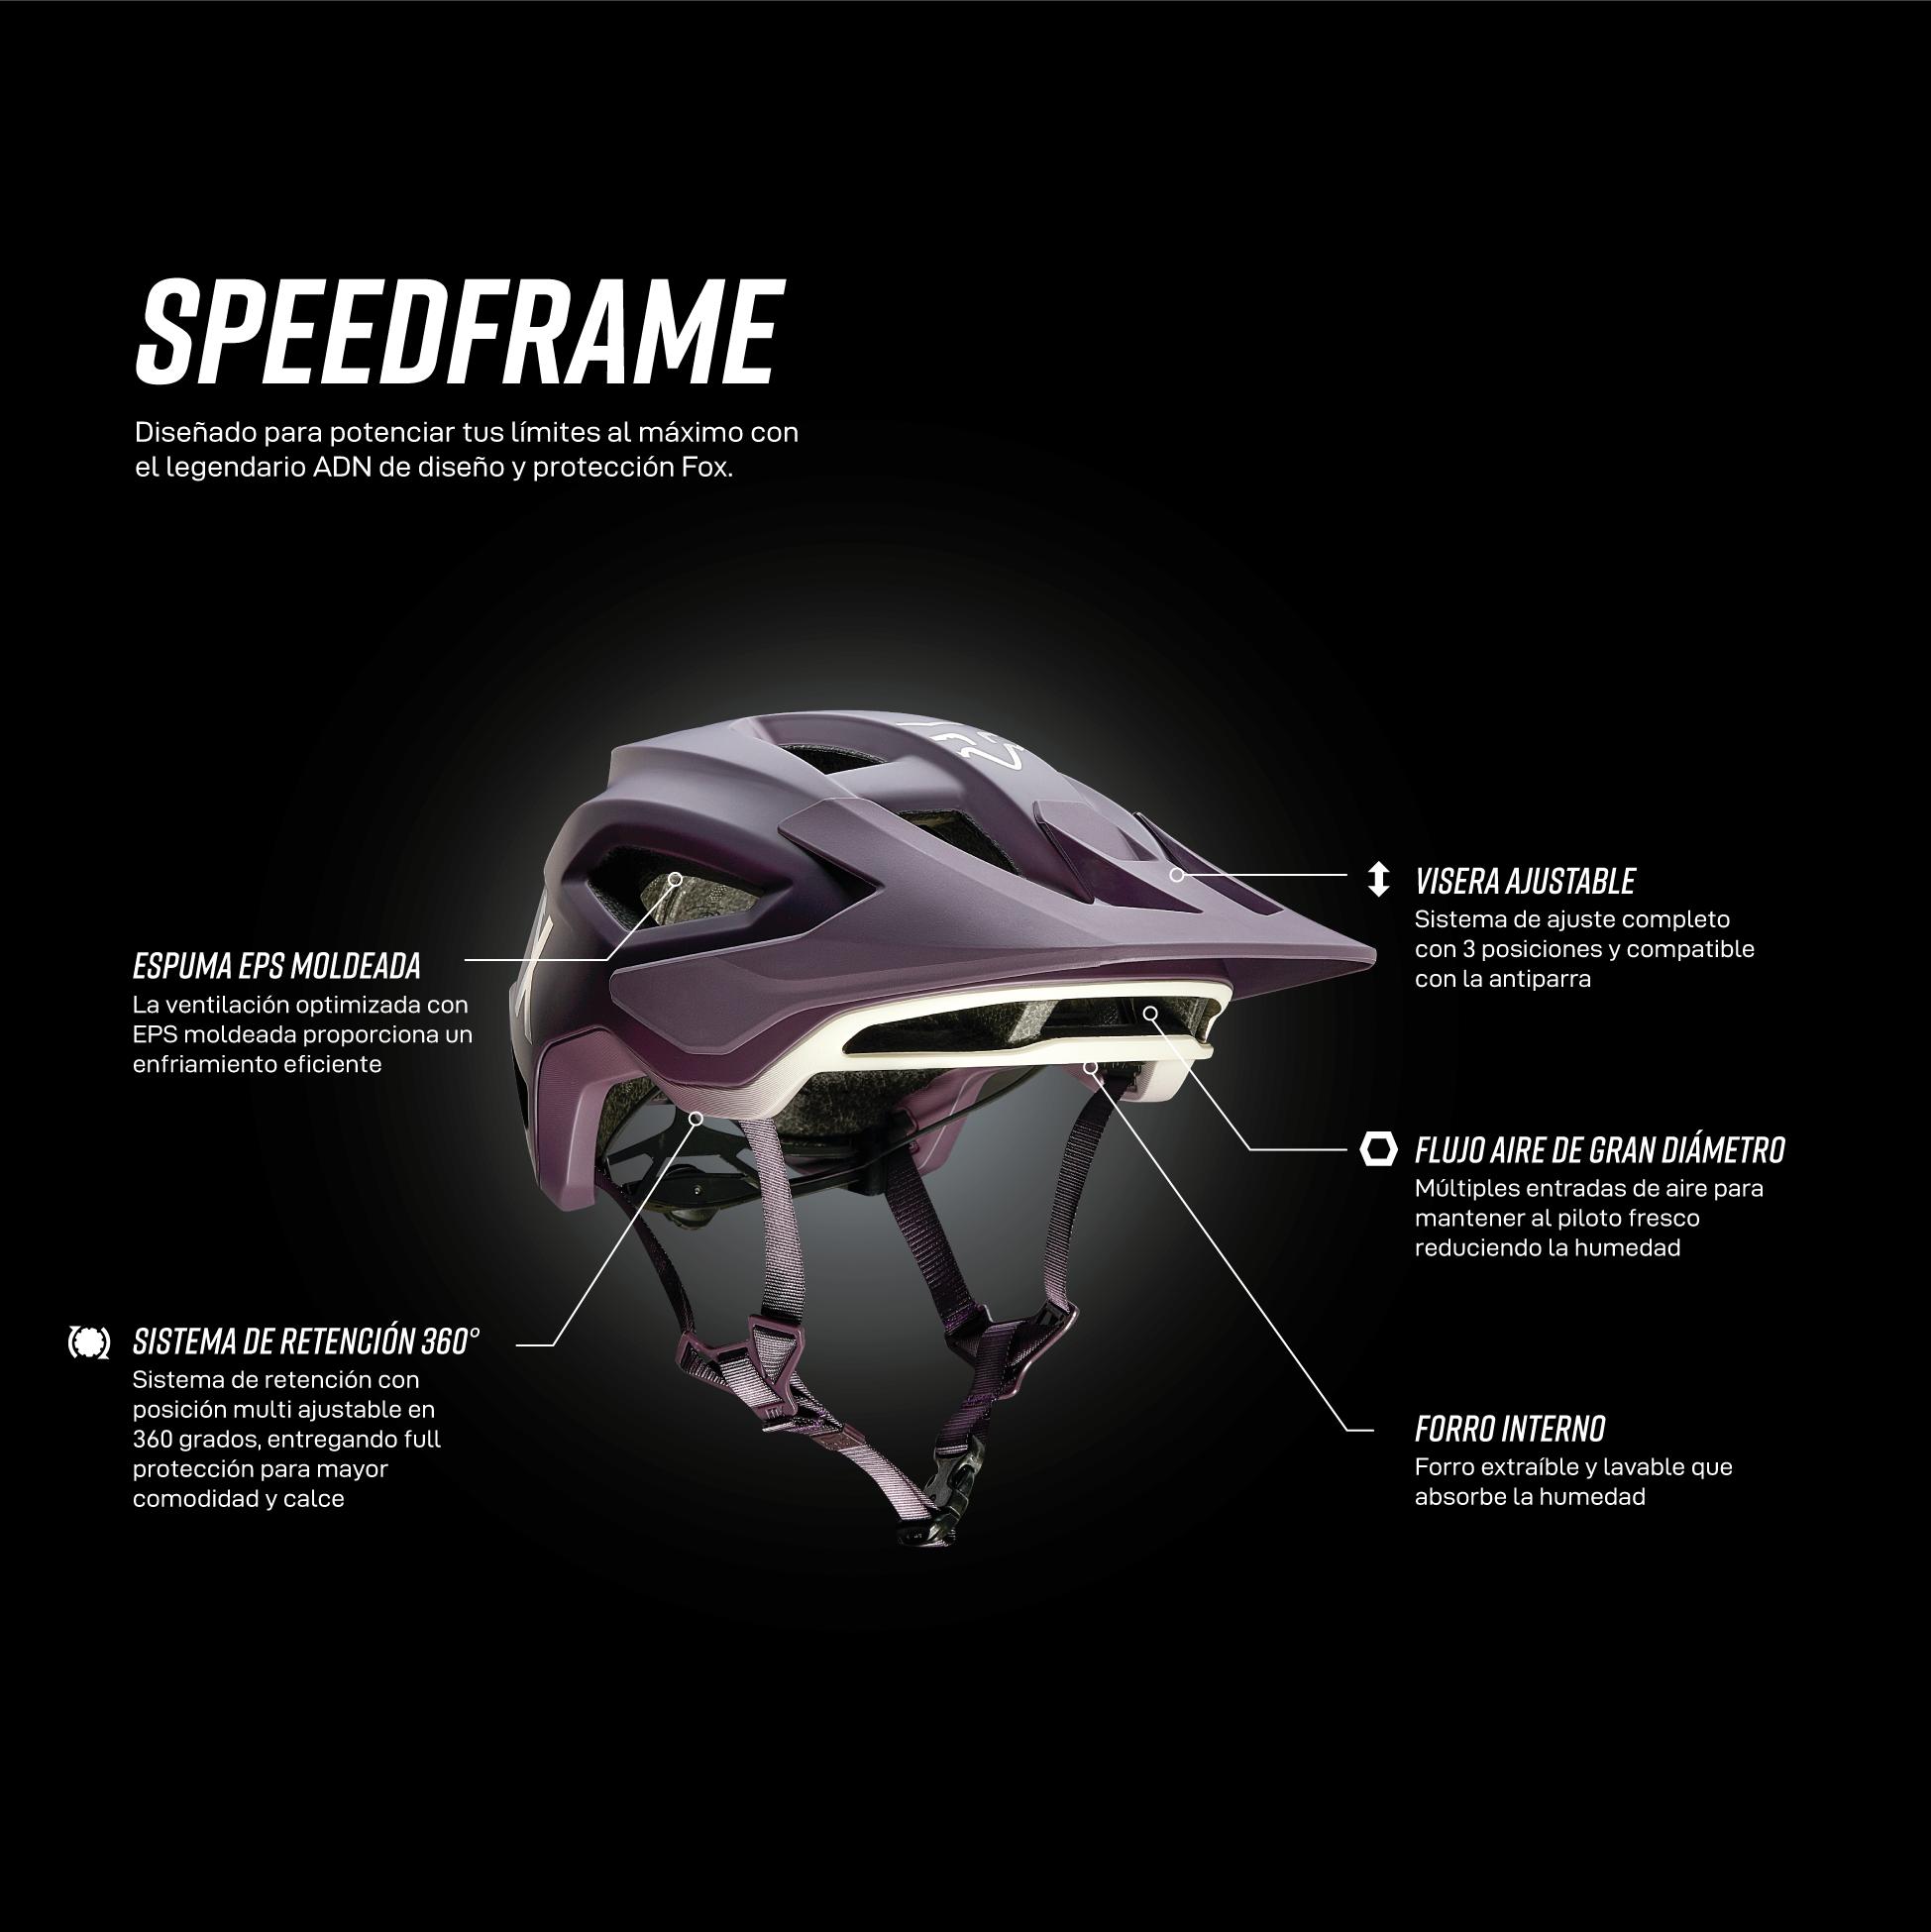 Speedframe-Morado